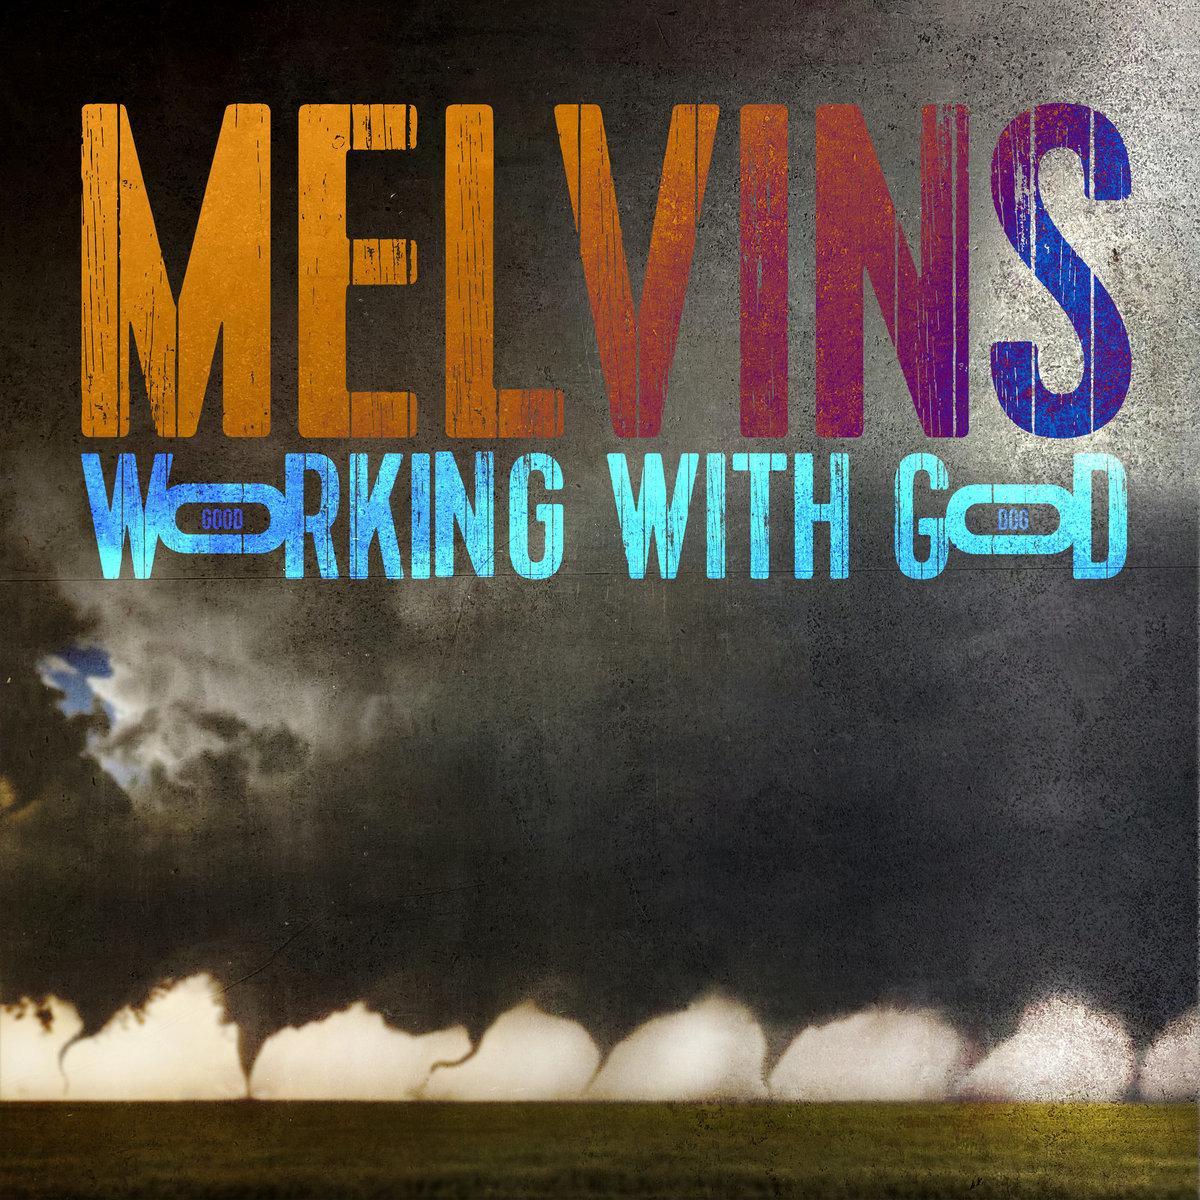 Working With God (Vinyl)